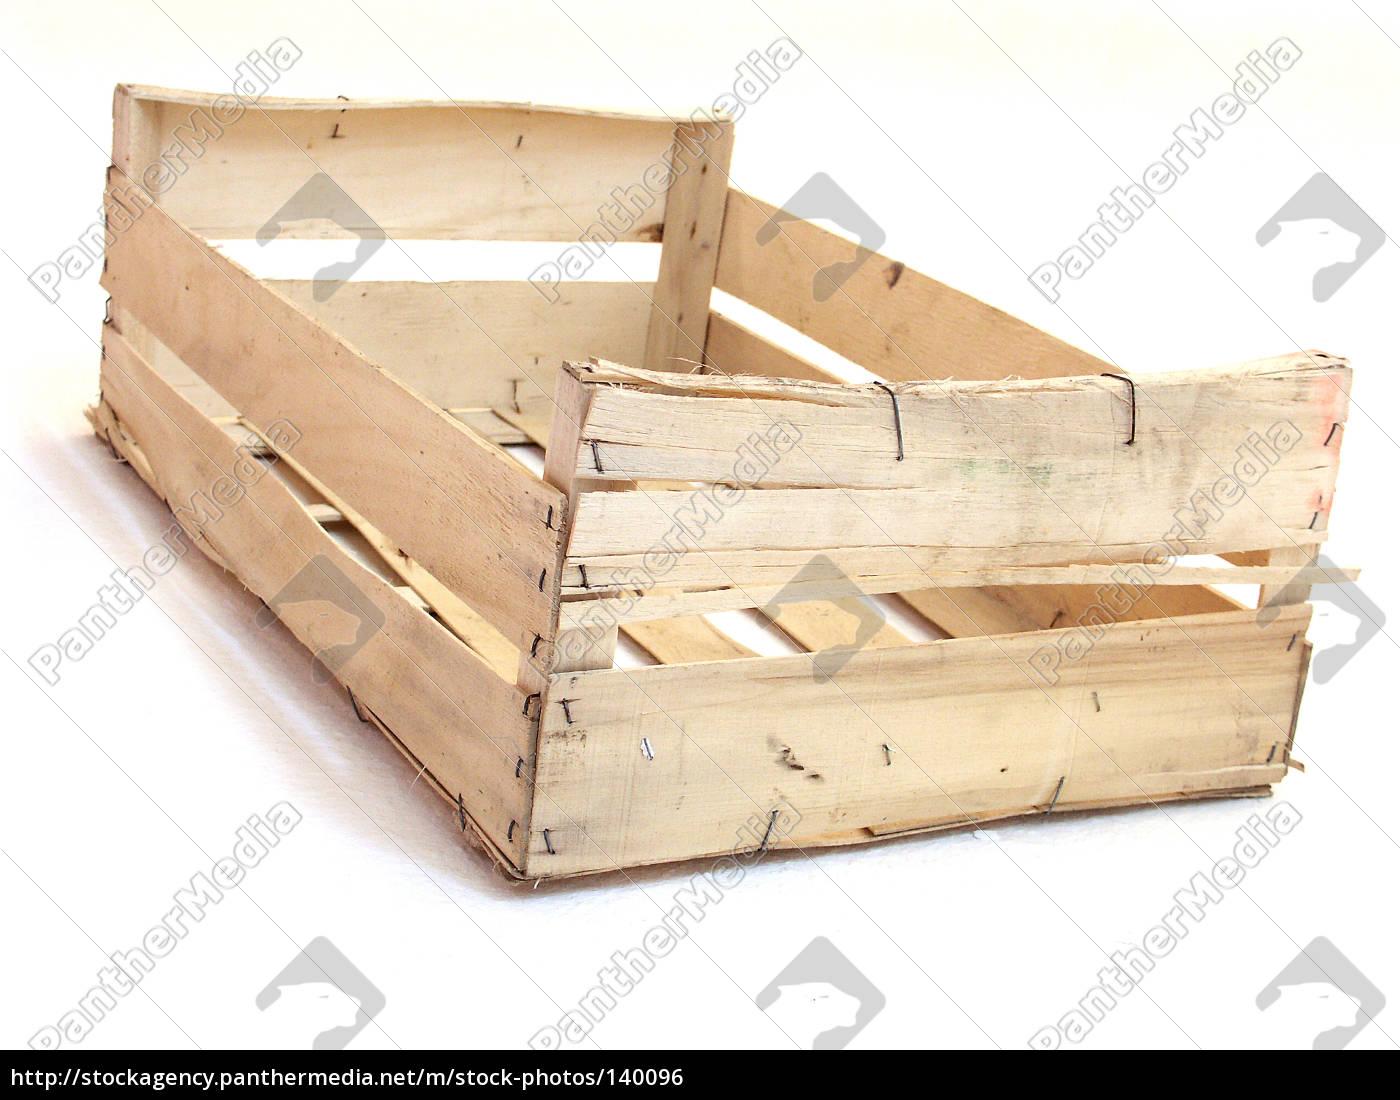 box - 140096